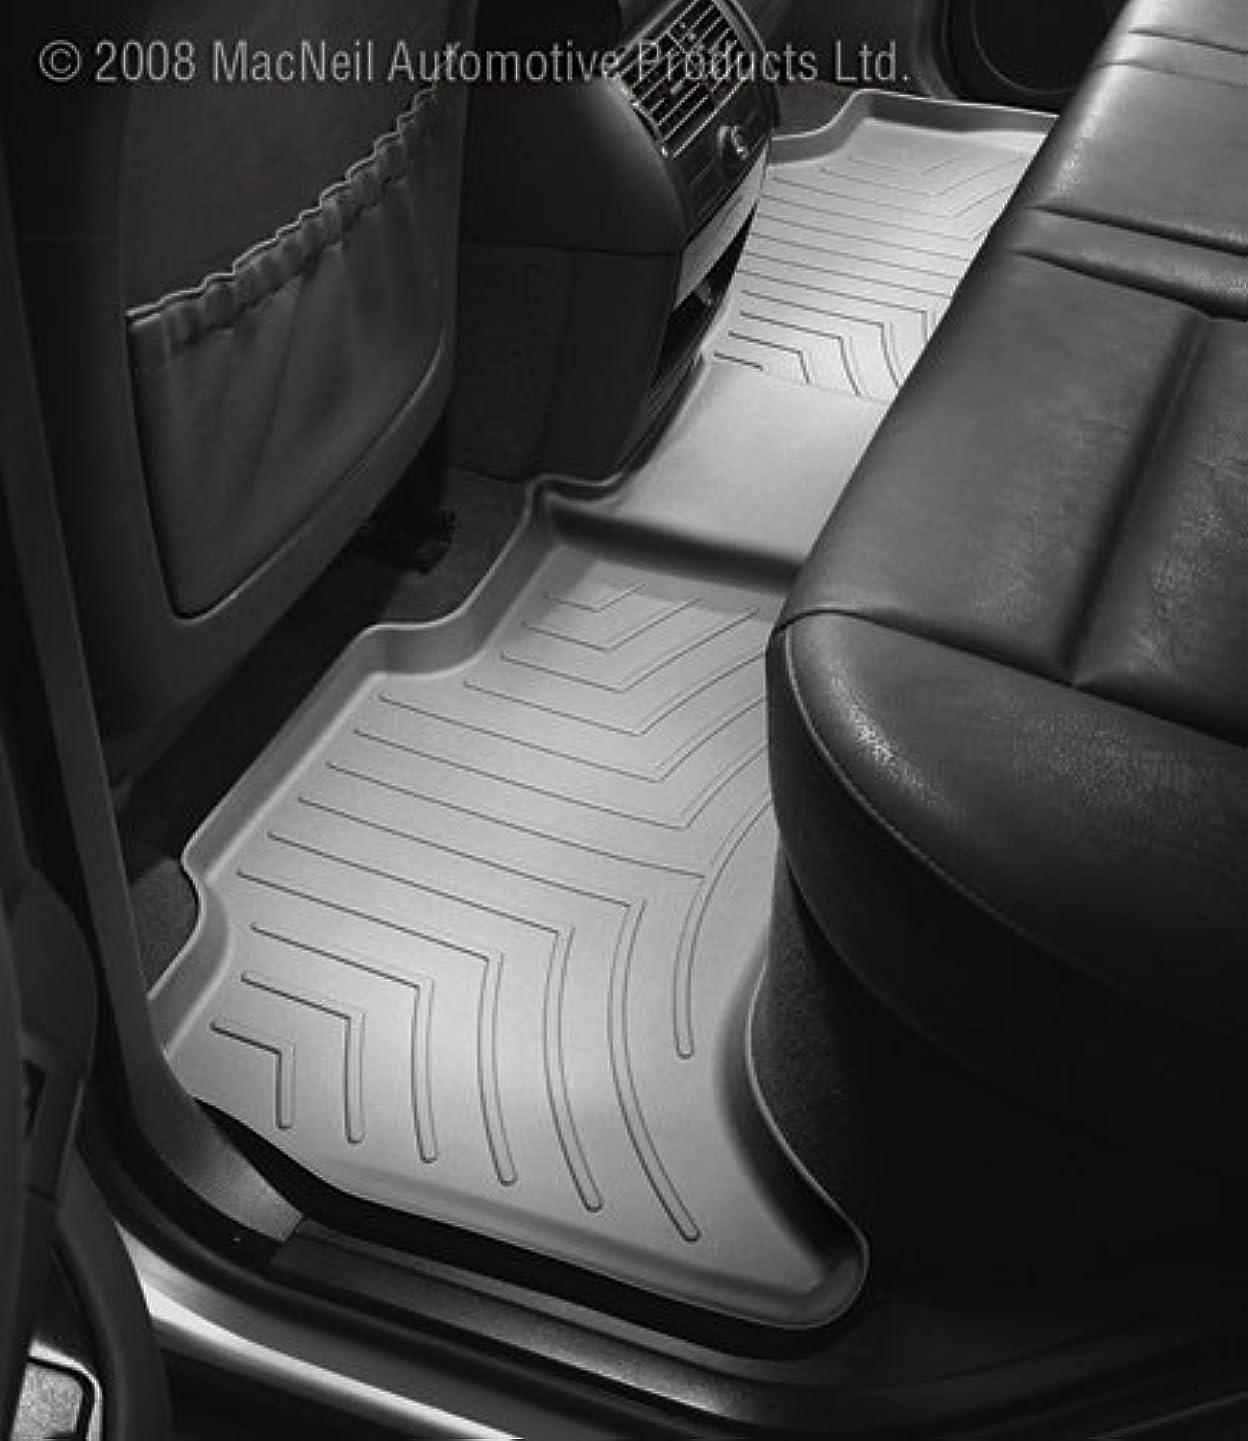 WeatherTech Custom Fit Rear FloorLiner for Dodge Ram 1500 Crew Cab, Grey